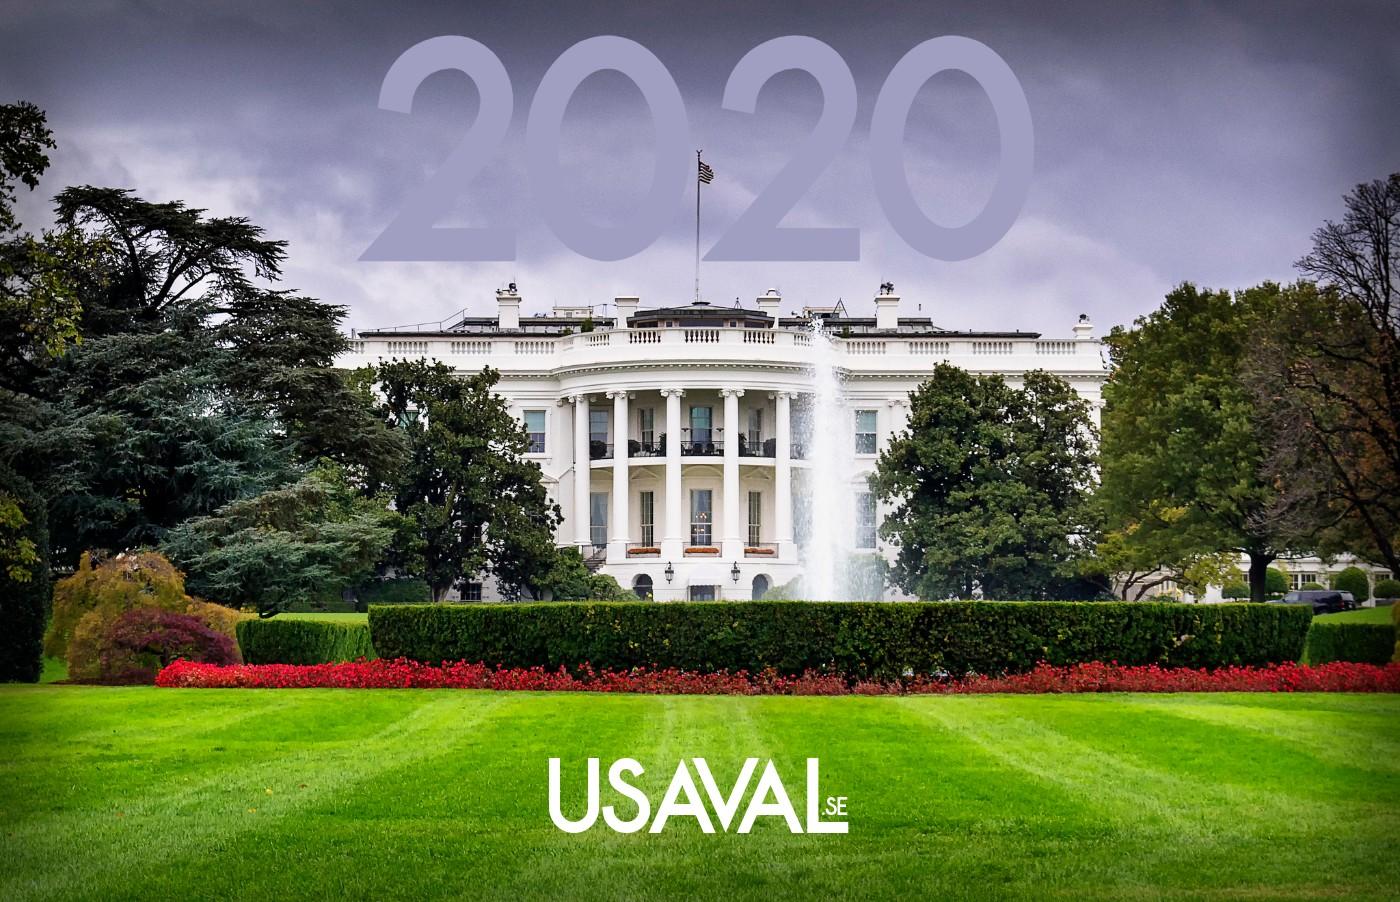 Republikansk senatsledare kritiserar Vita Huset